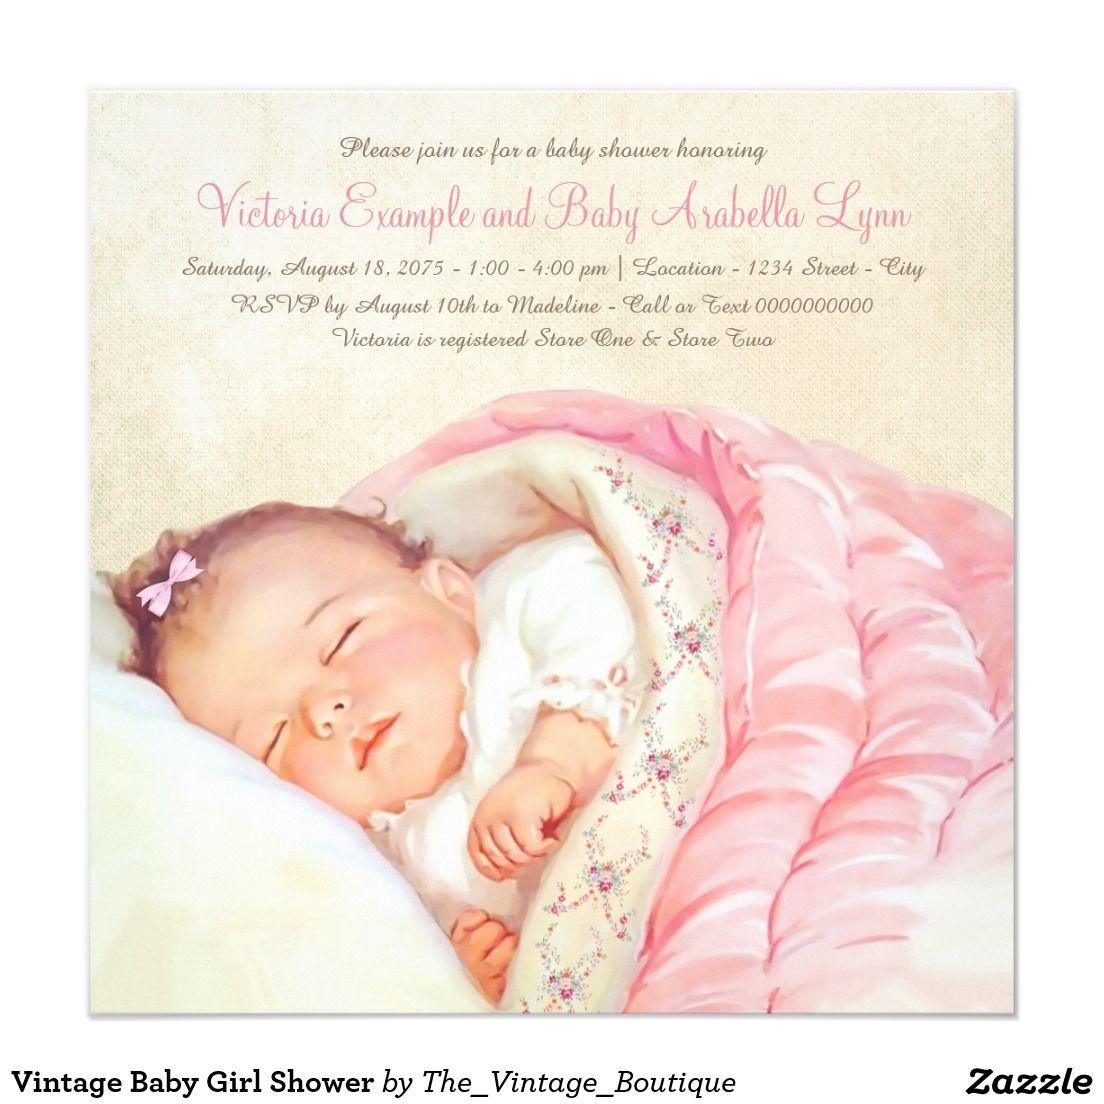 Vintage Baby Girl Shower Card | Baby girl shower